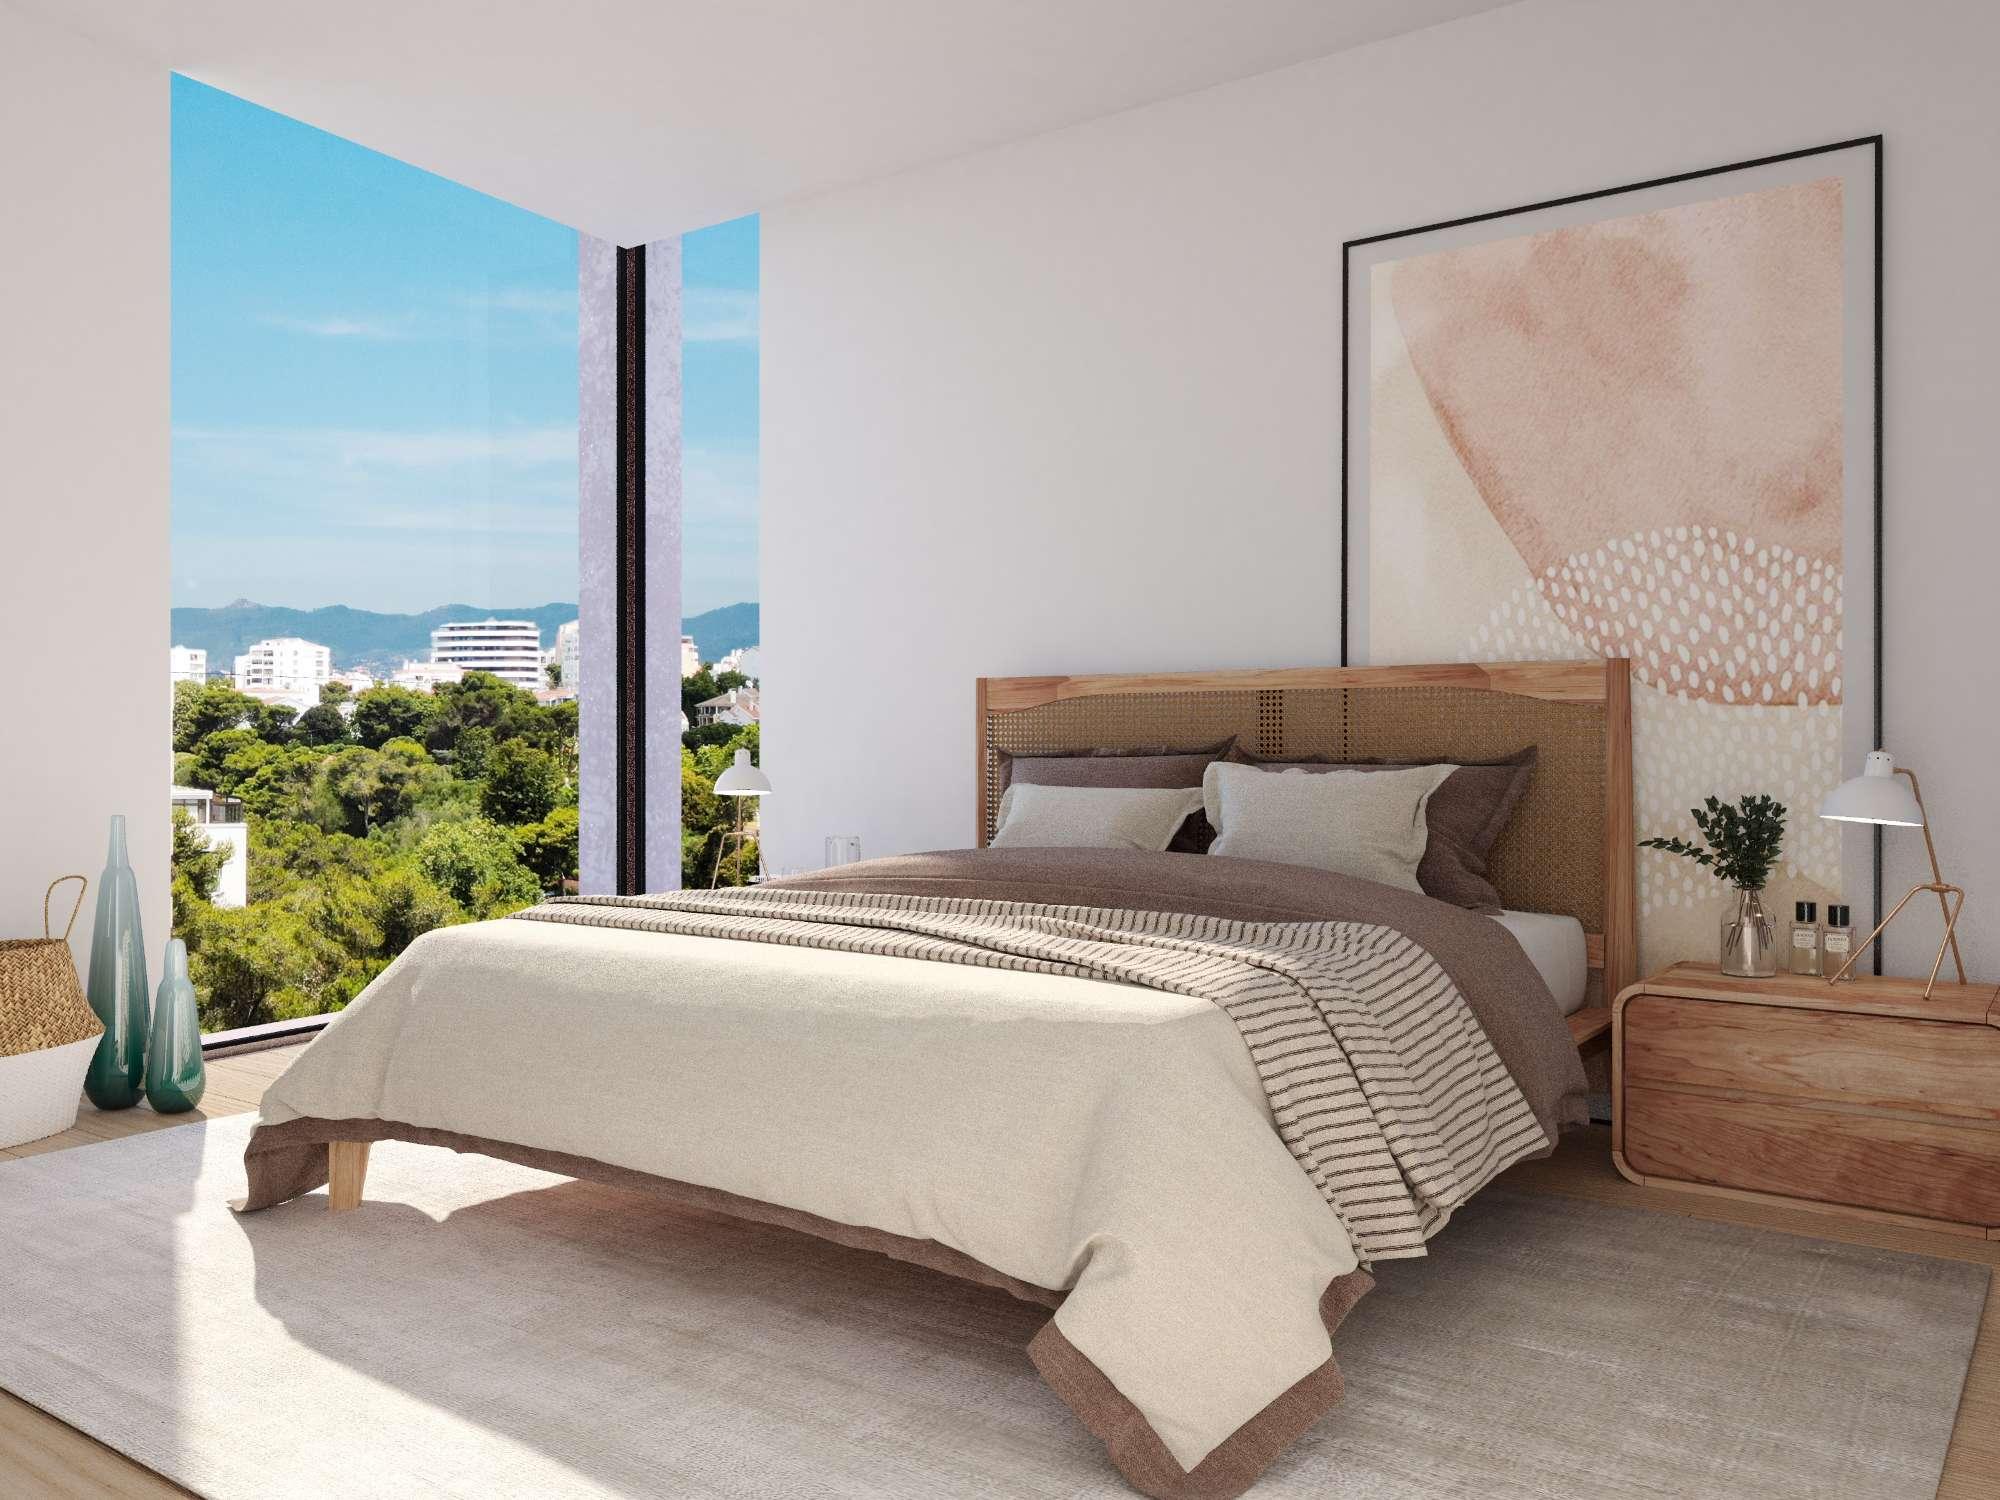 images-prod-prop-023424-the_coral_bedroom_3_1628079192104-jpg